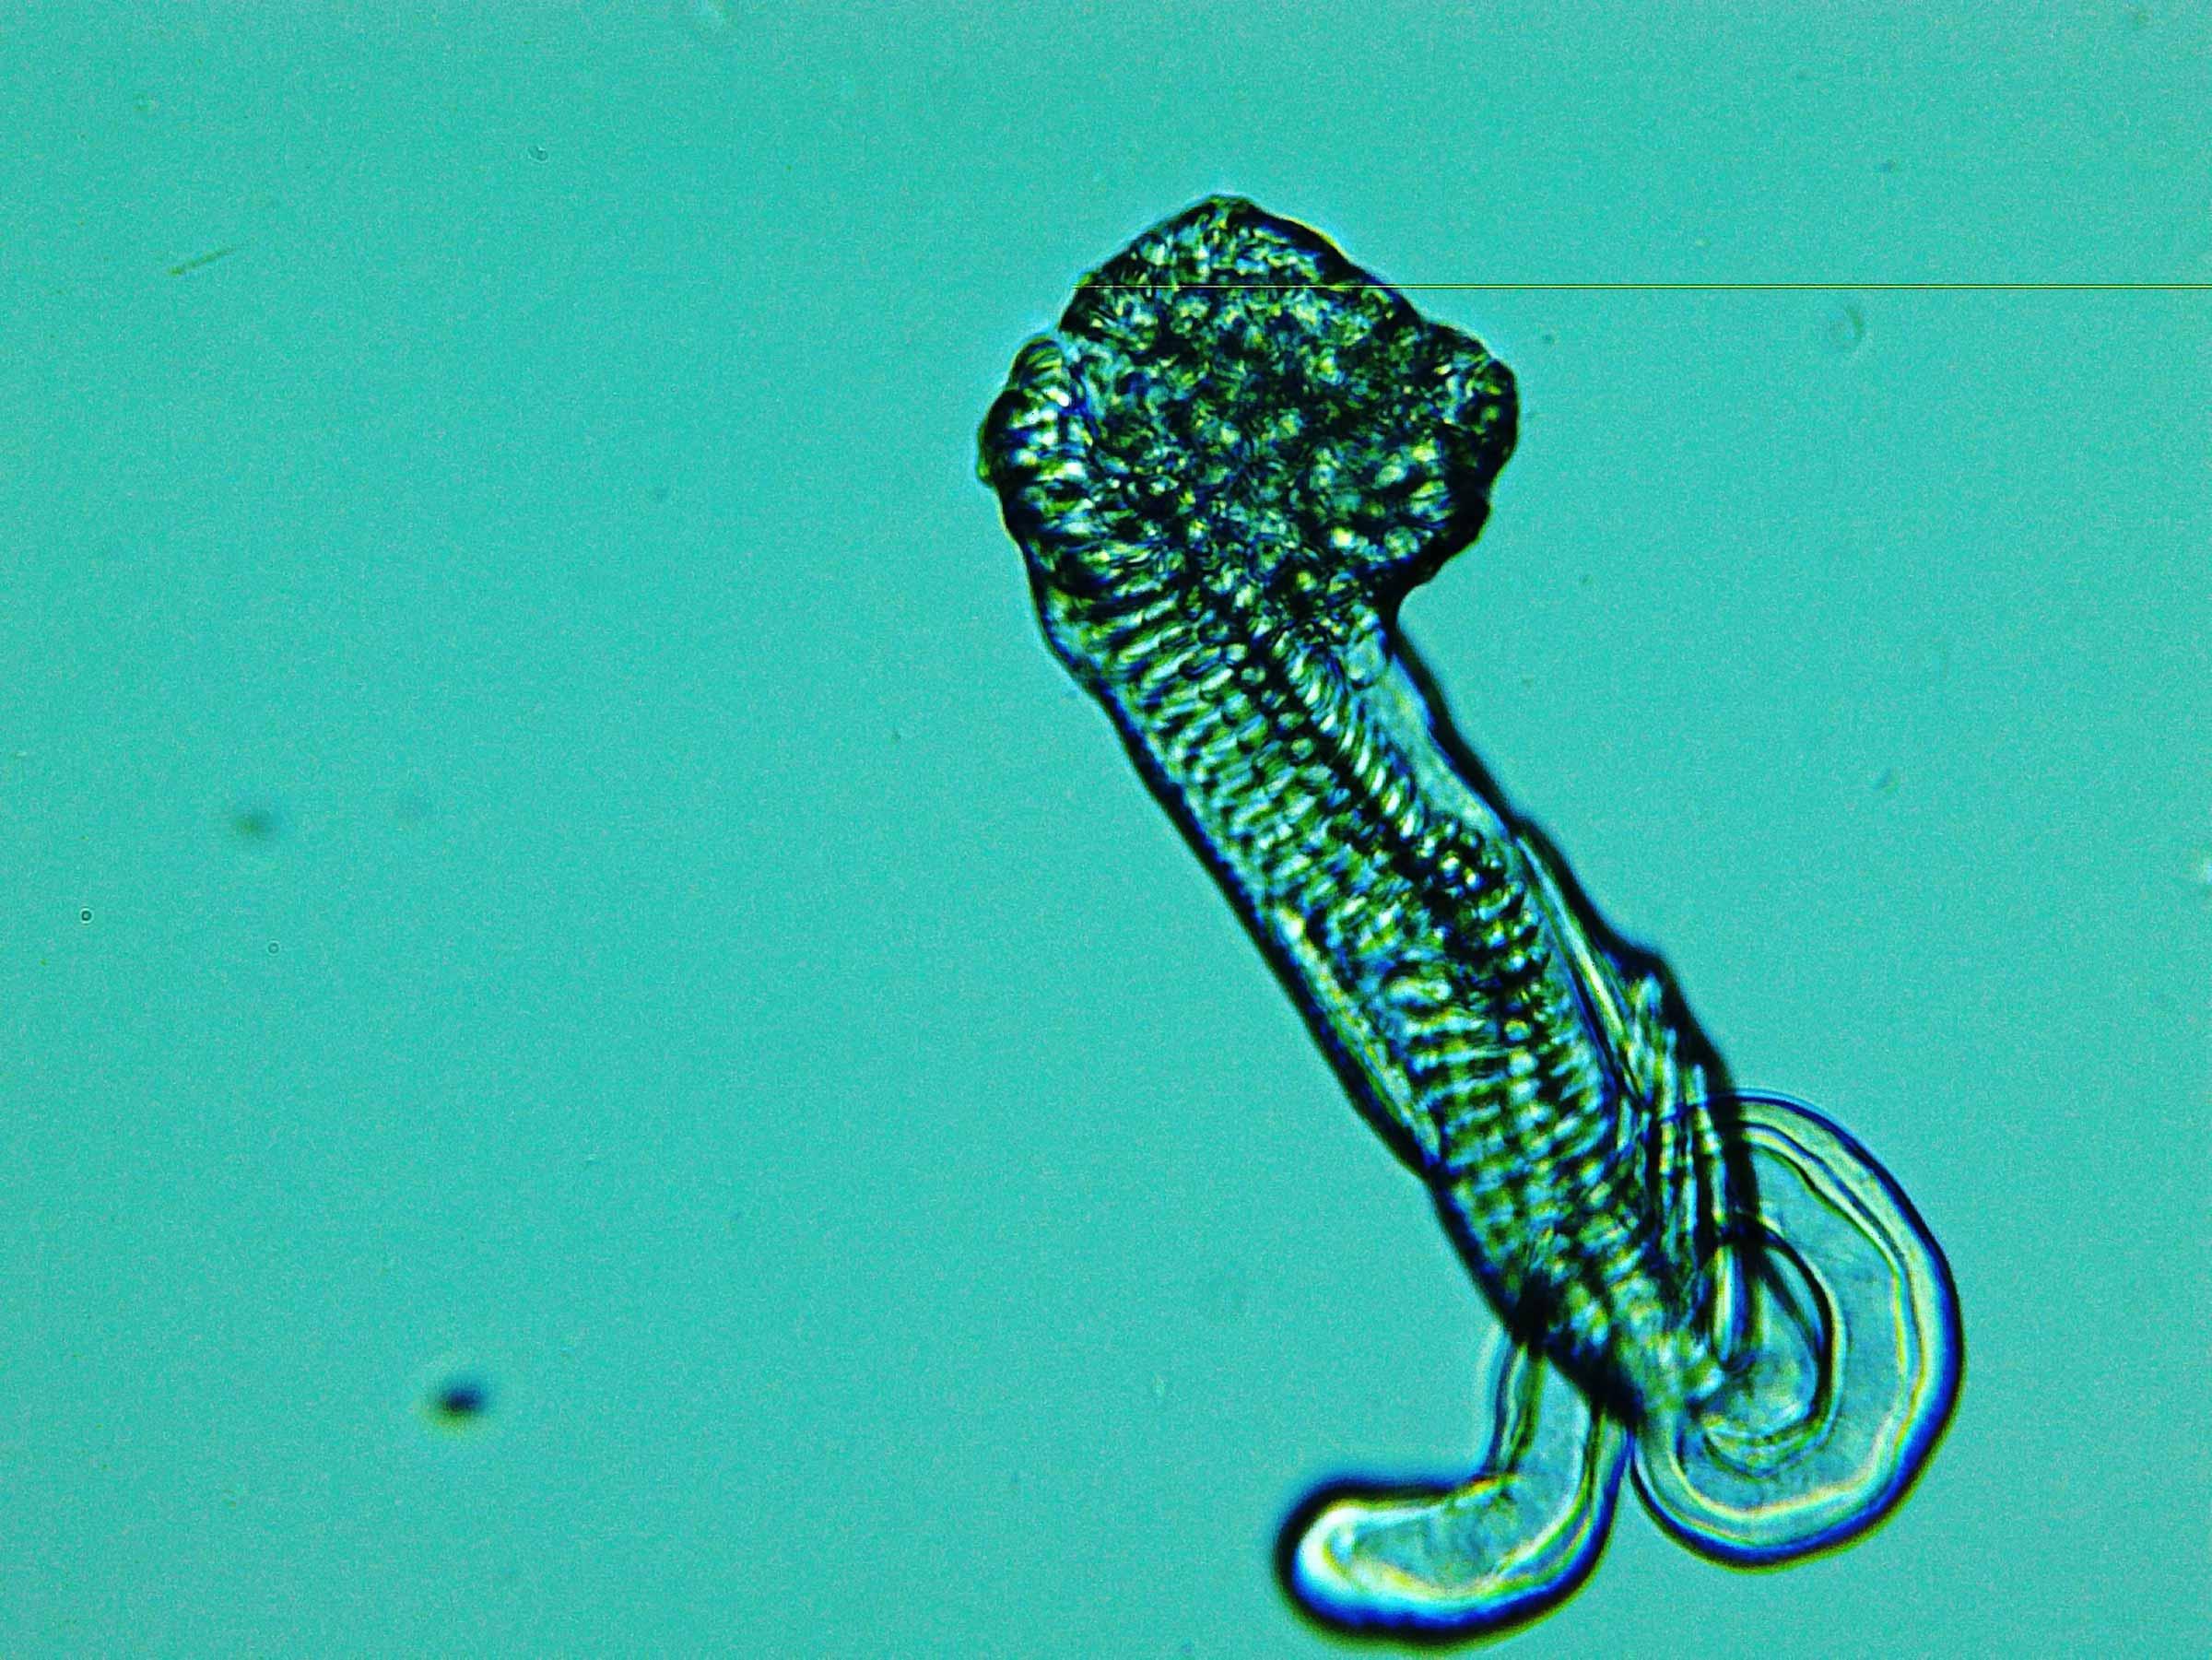 mystery plankton